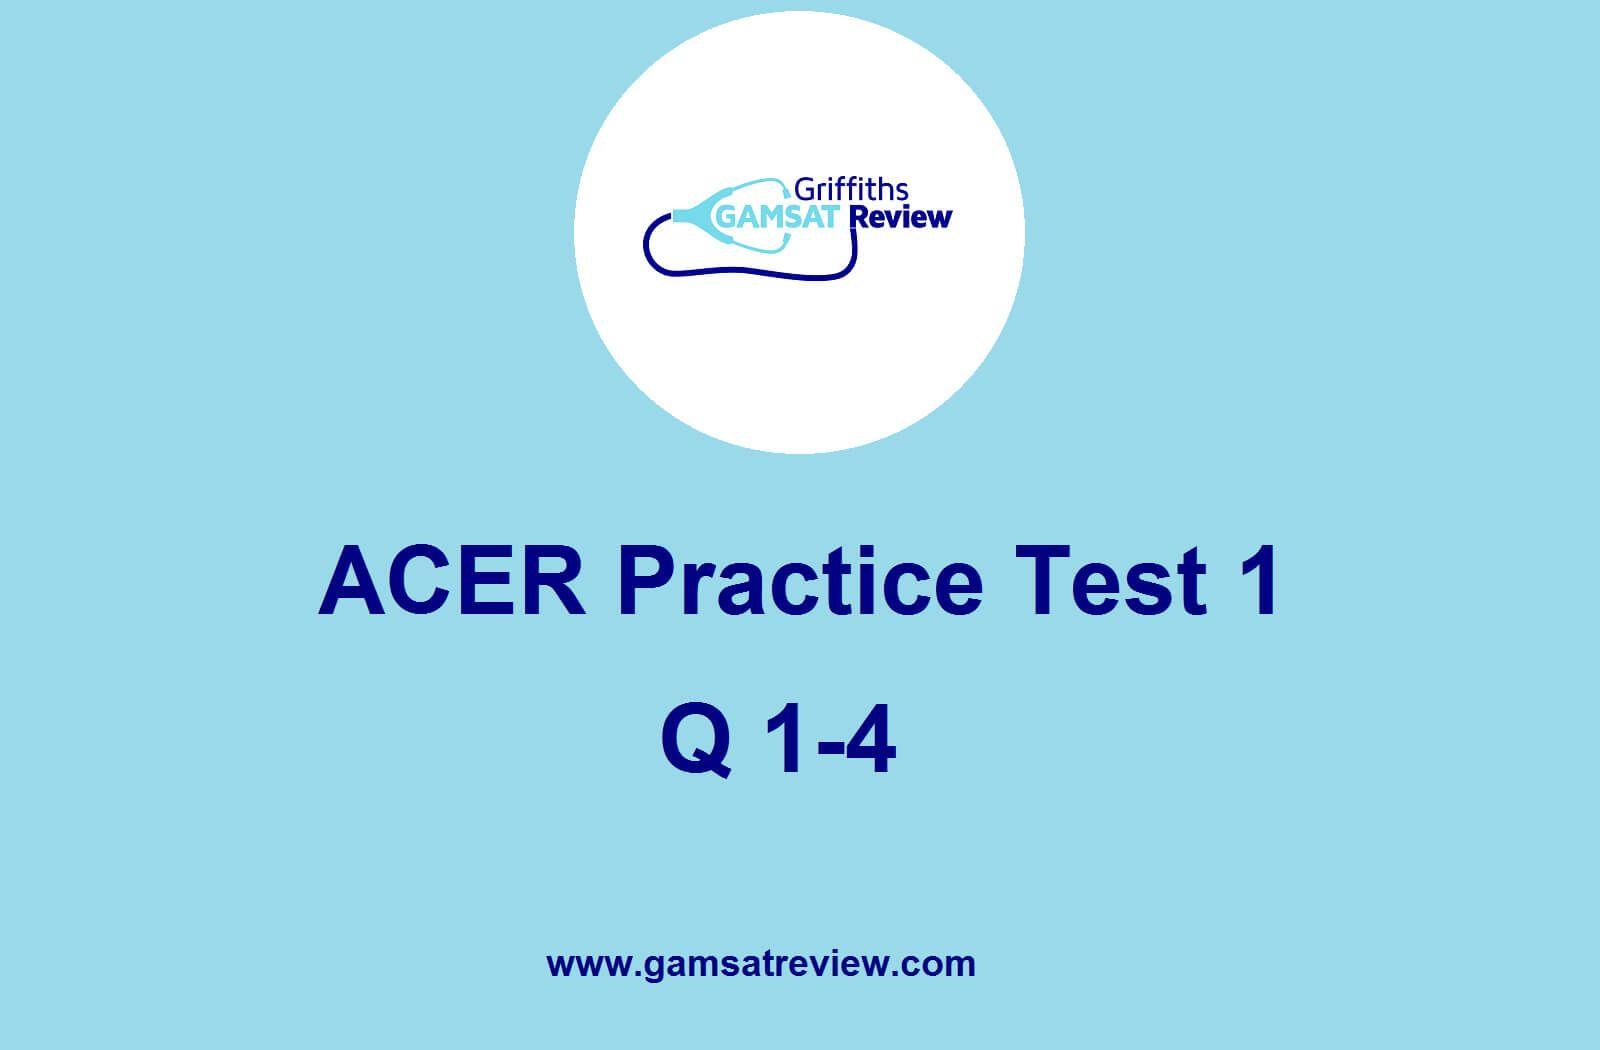 Gamsat Practice Test 1 Solutions